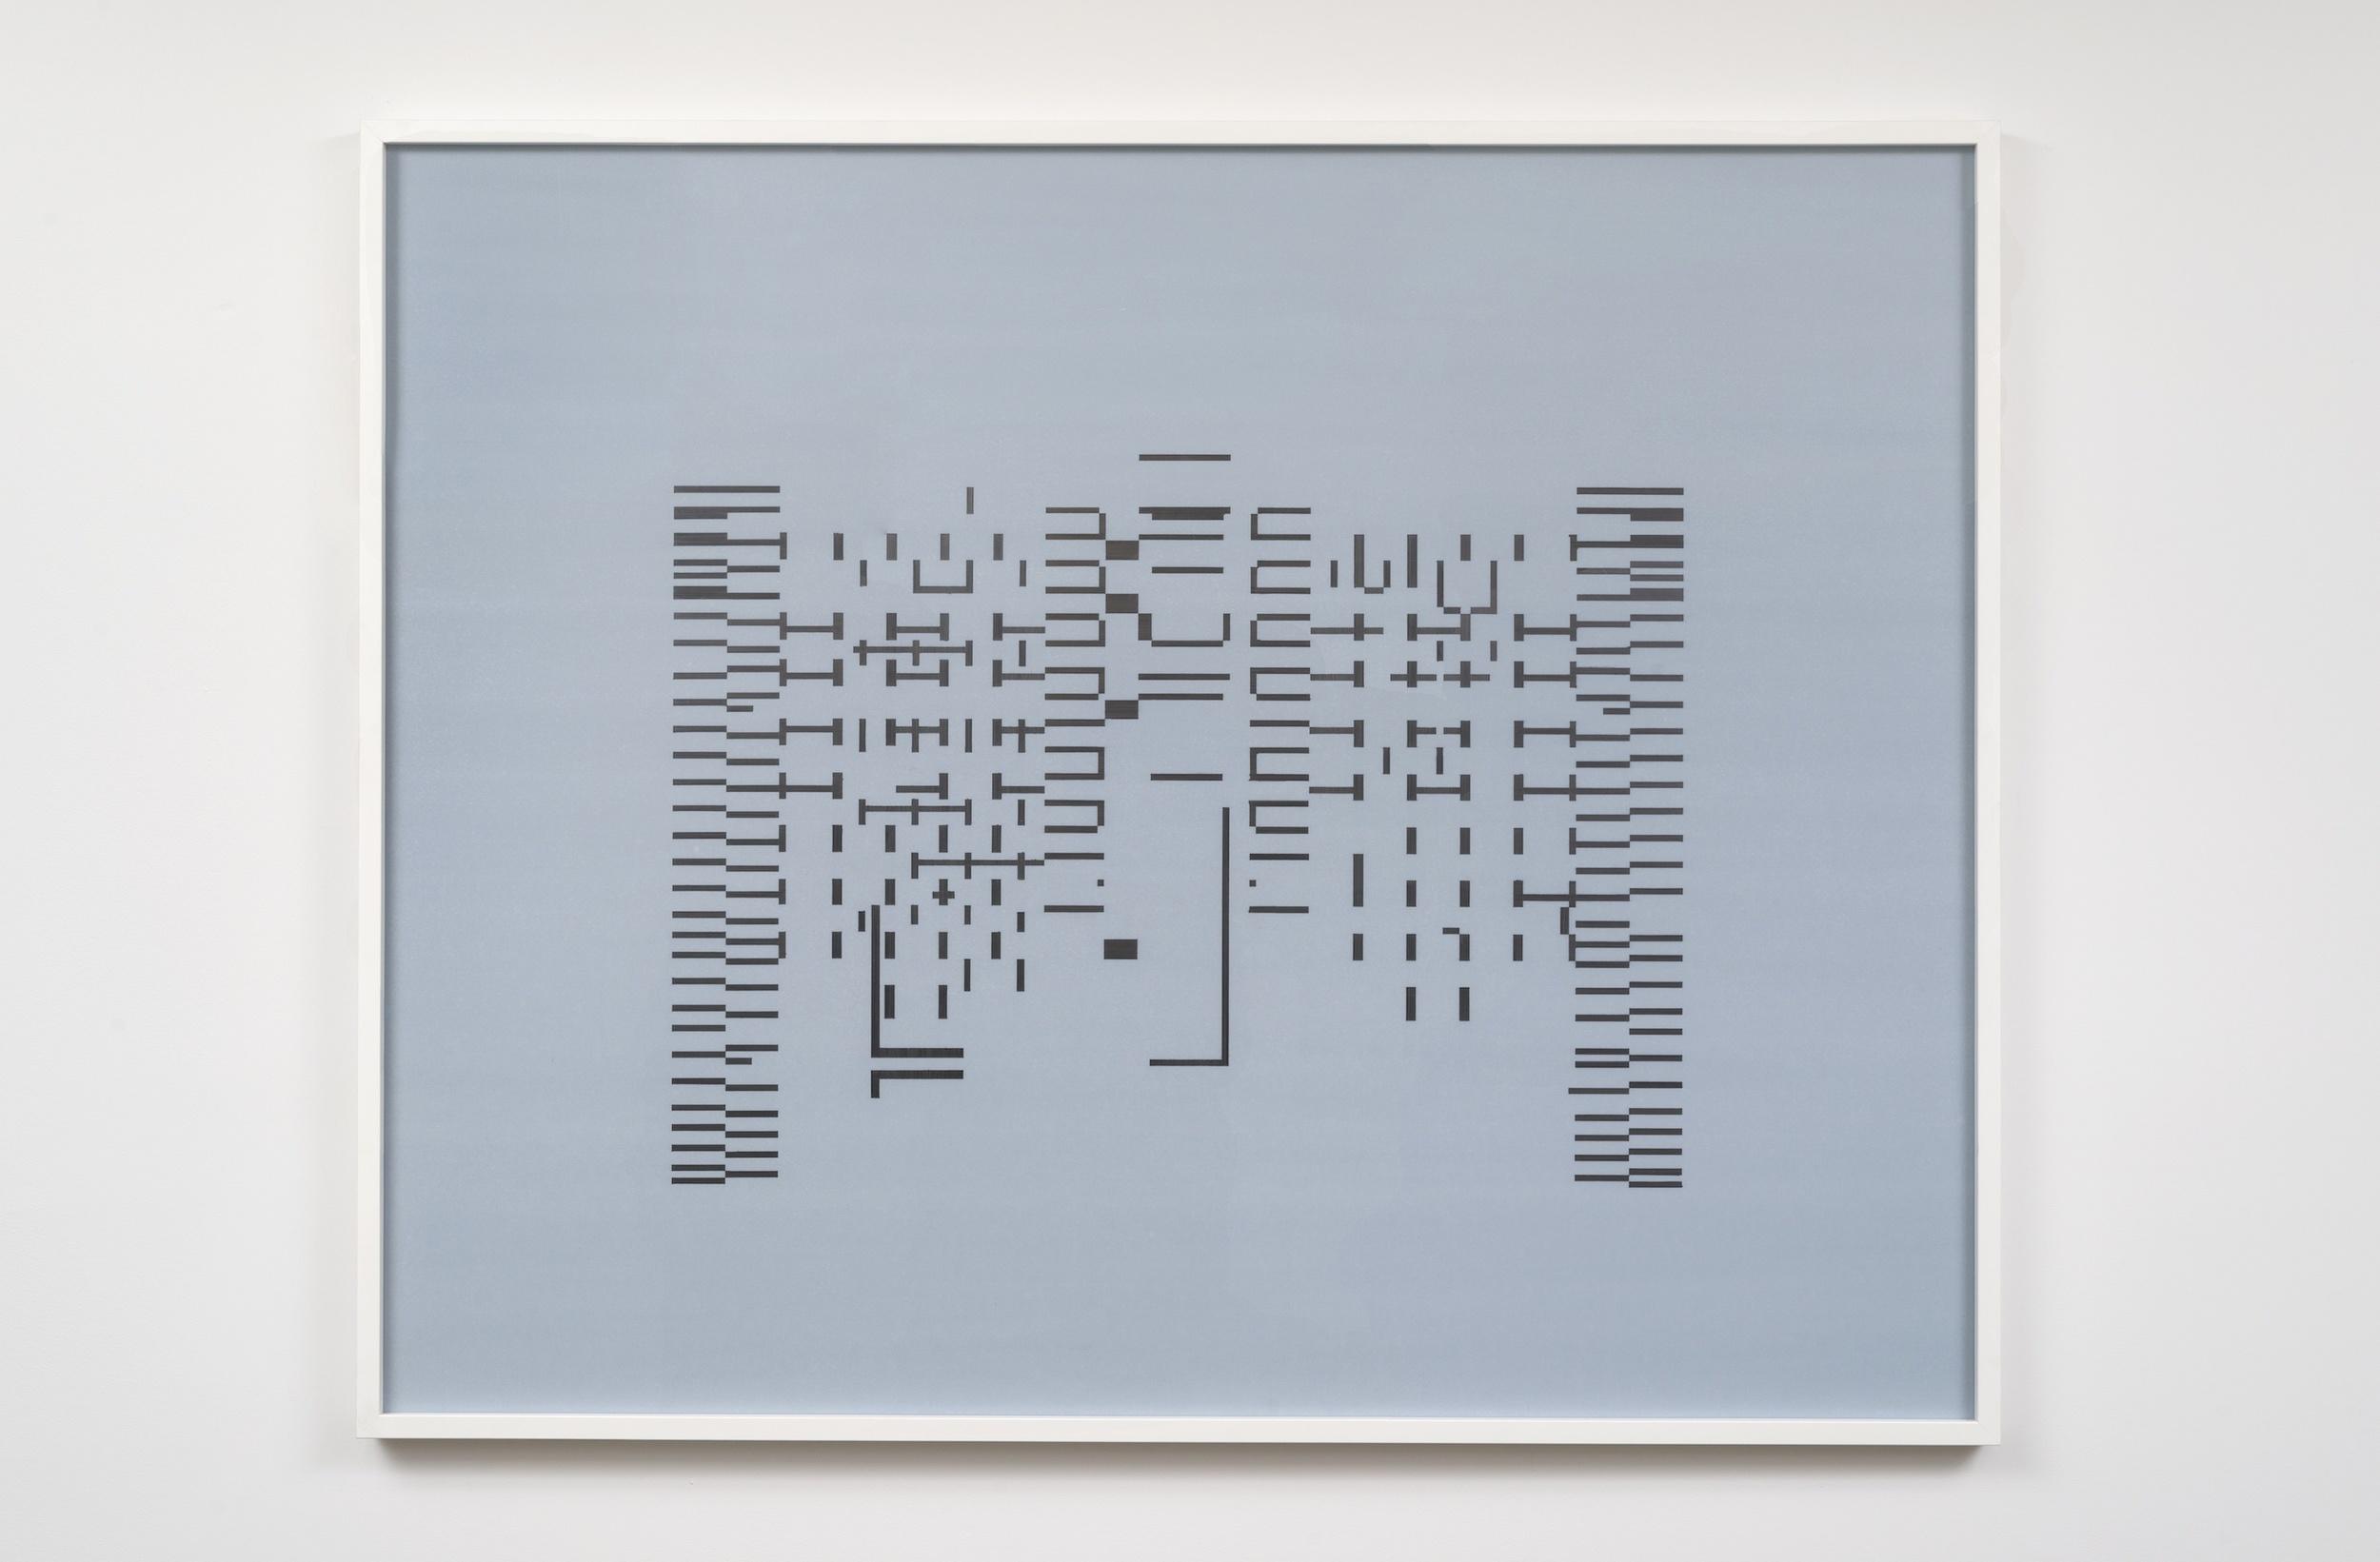 Joseph Huppert, Untitled IV  , 2015,   graphite on mylar,  40 x 60 inches